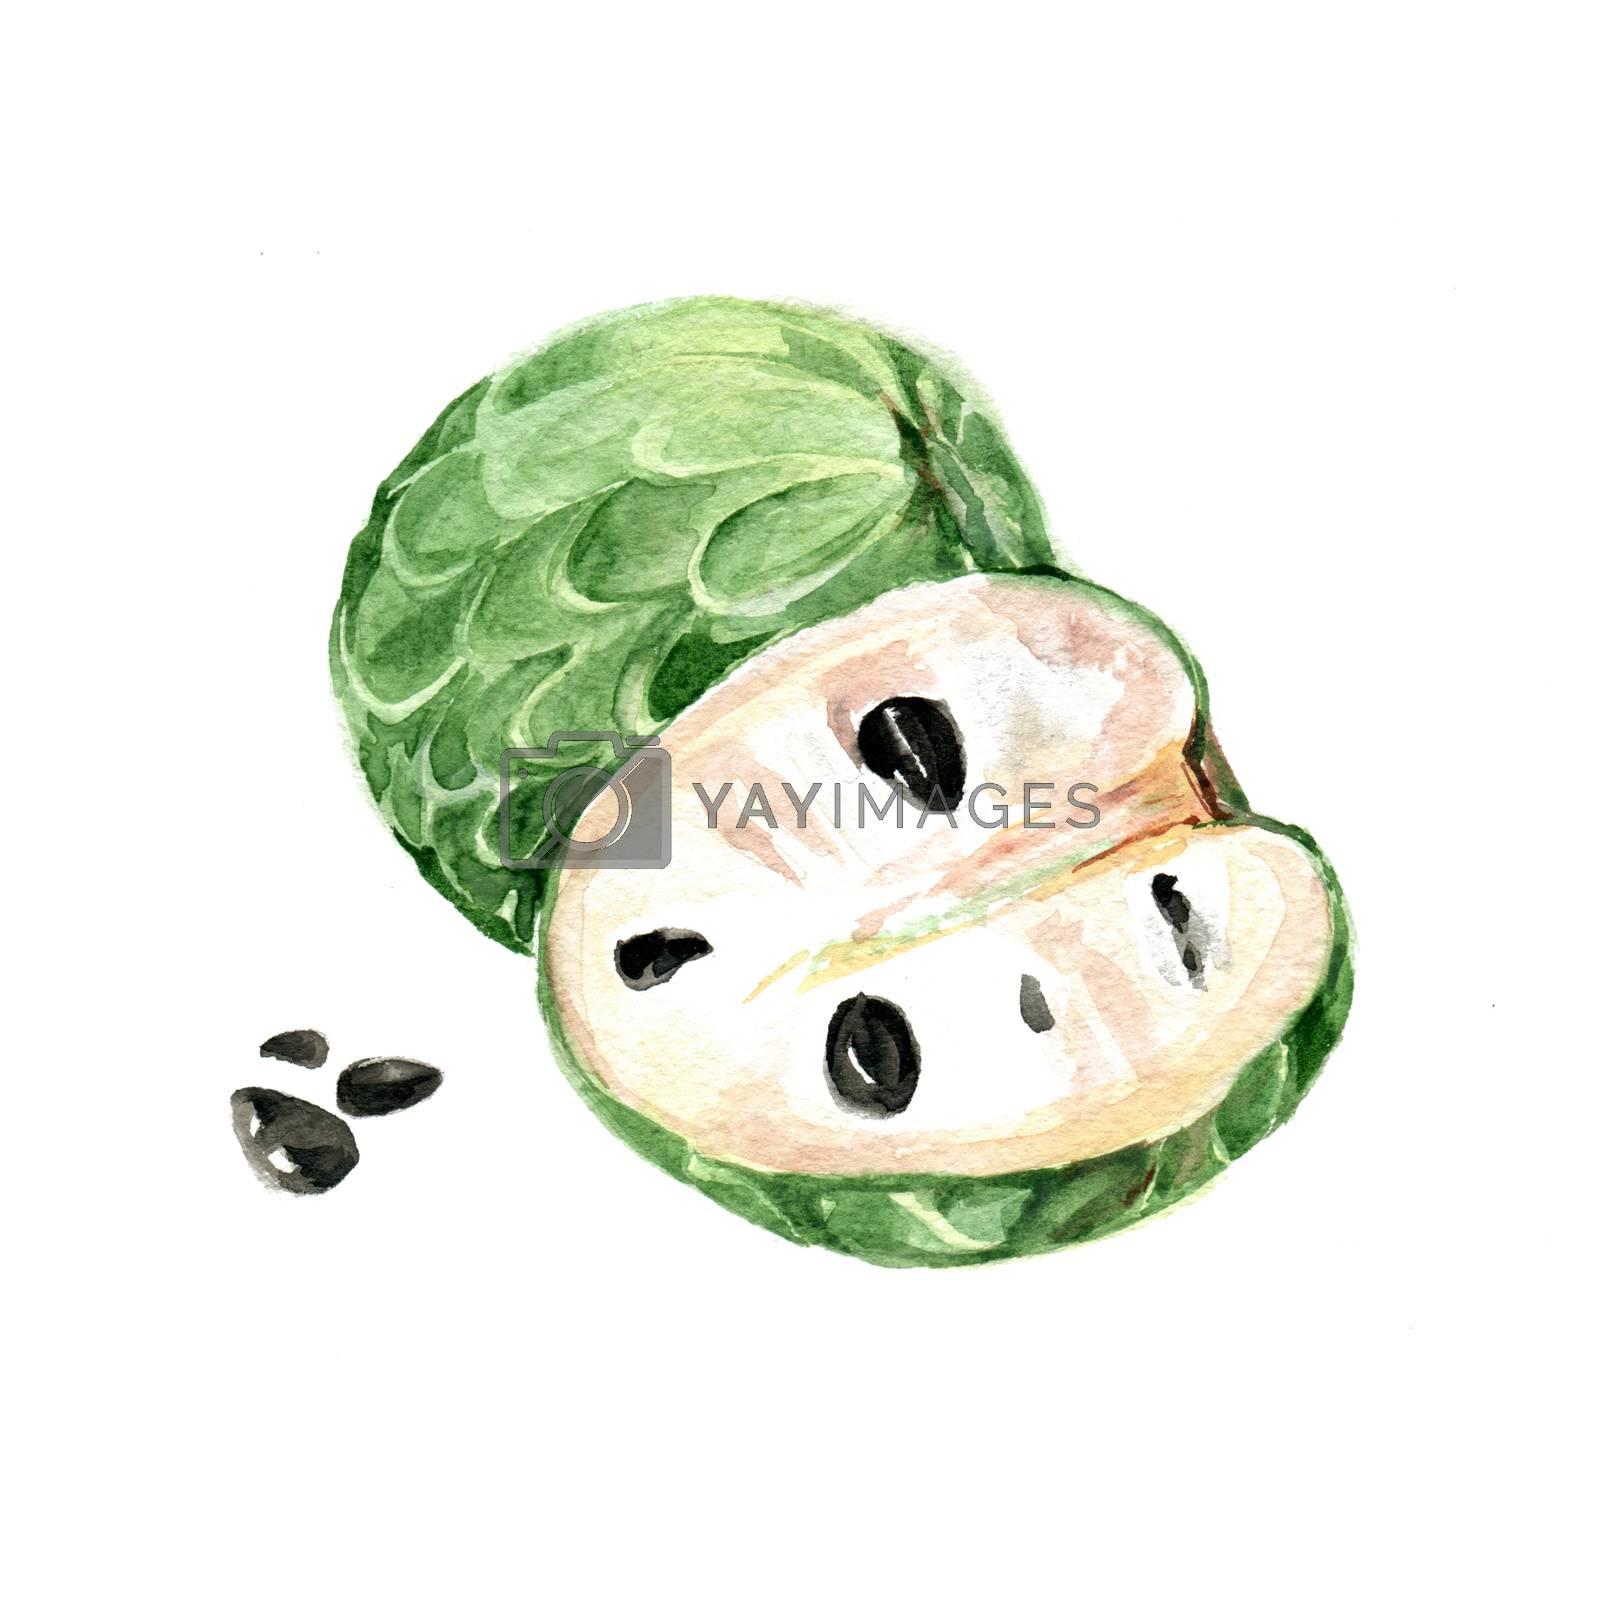 Watercolor Annona. Hand Drawn Illustration Organic Food Vegetarian Ingredient